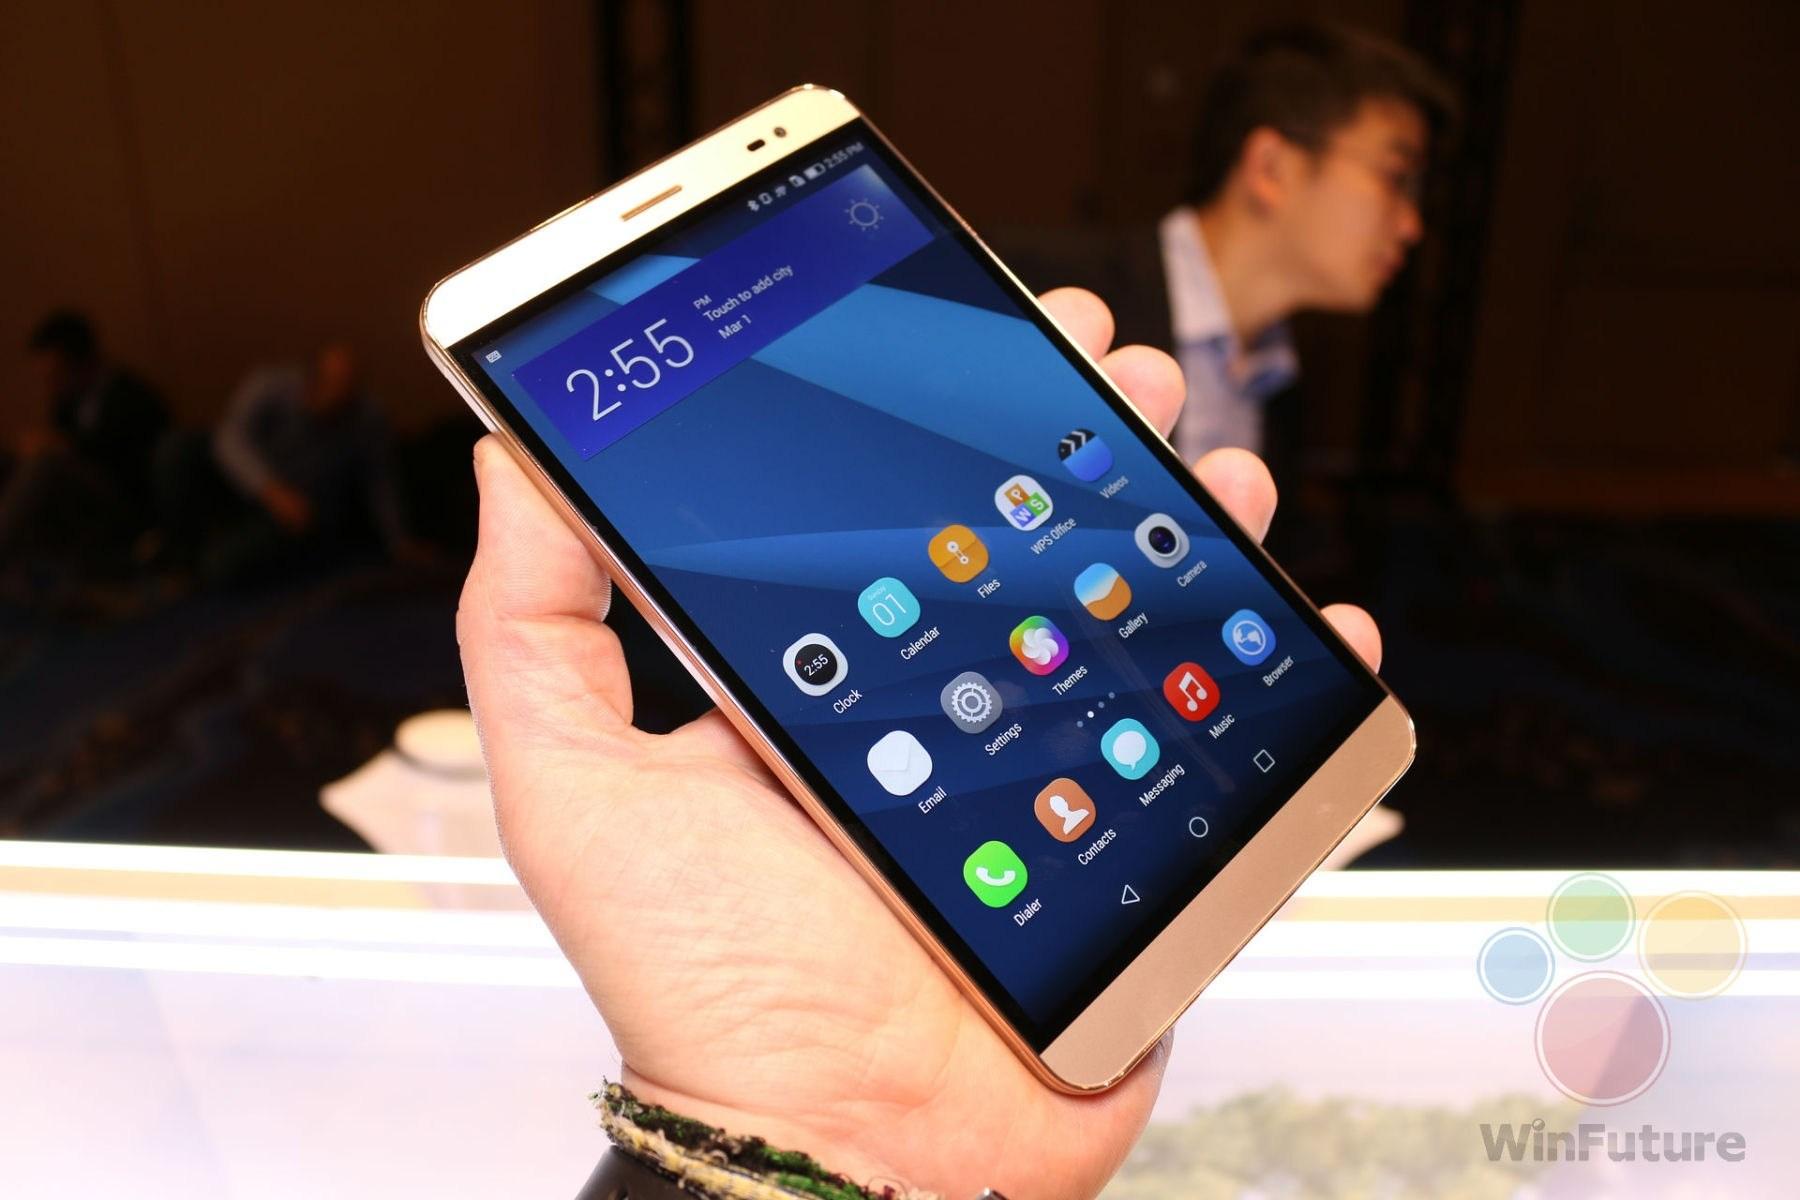 Huawei MediaPad X2: Edles & hochwertiges 7-Zoll-Tablet im